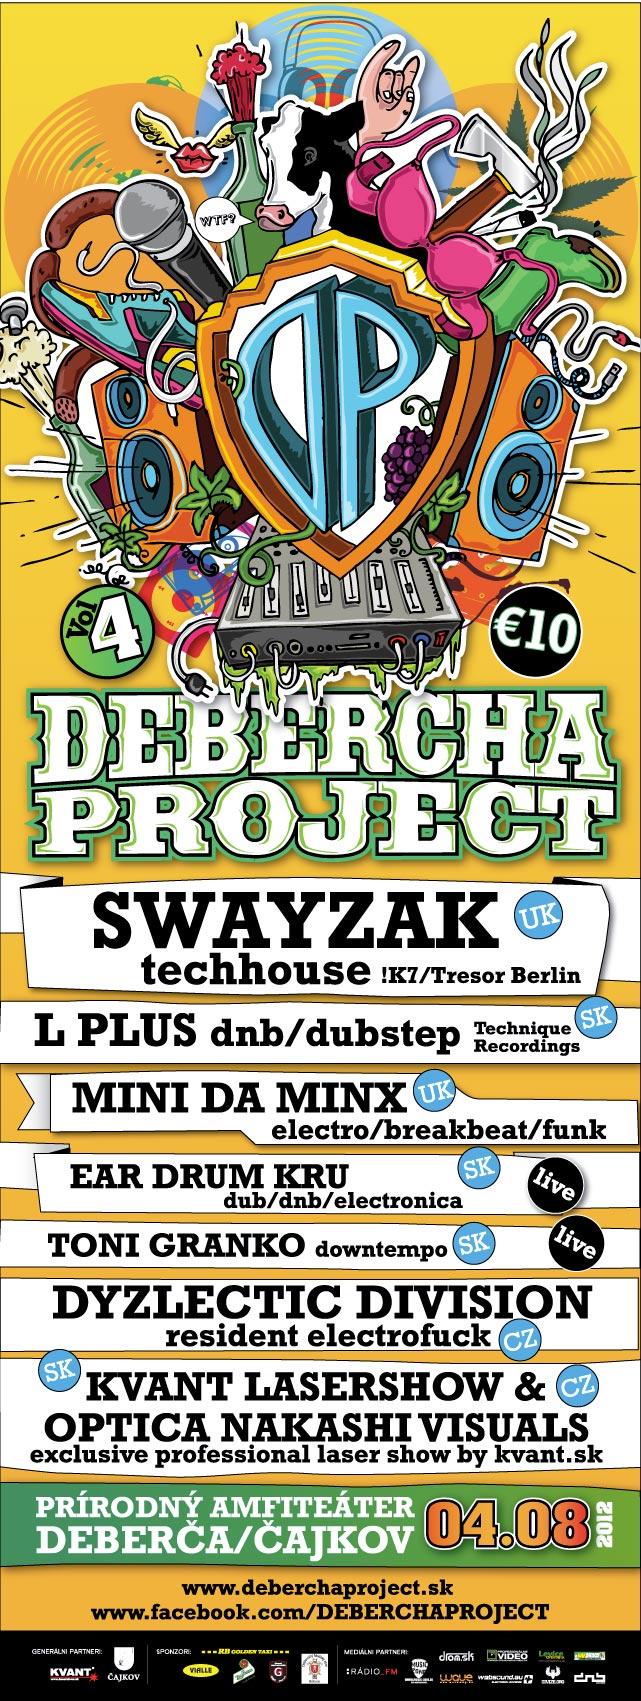 2012-08-04 - Swayzak @ Debercha Project Vol.4, Cajkov, Slovakia.jpg